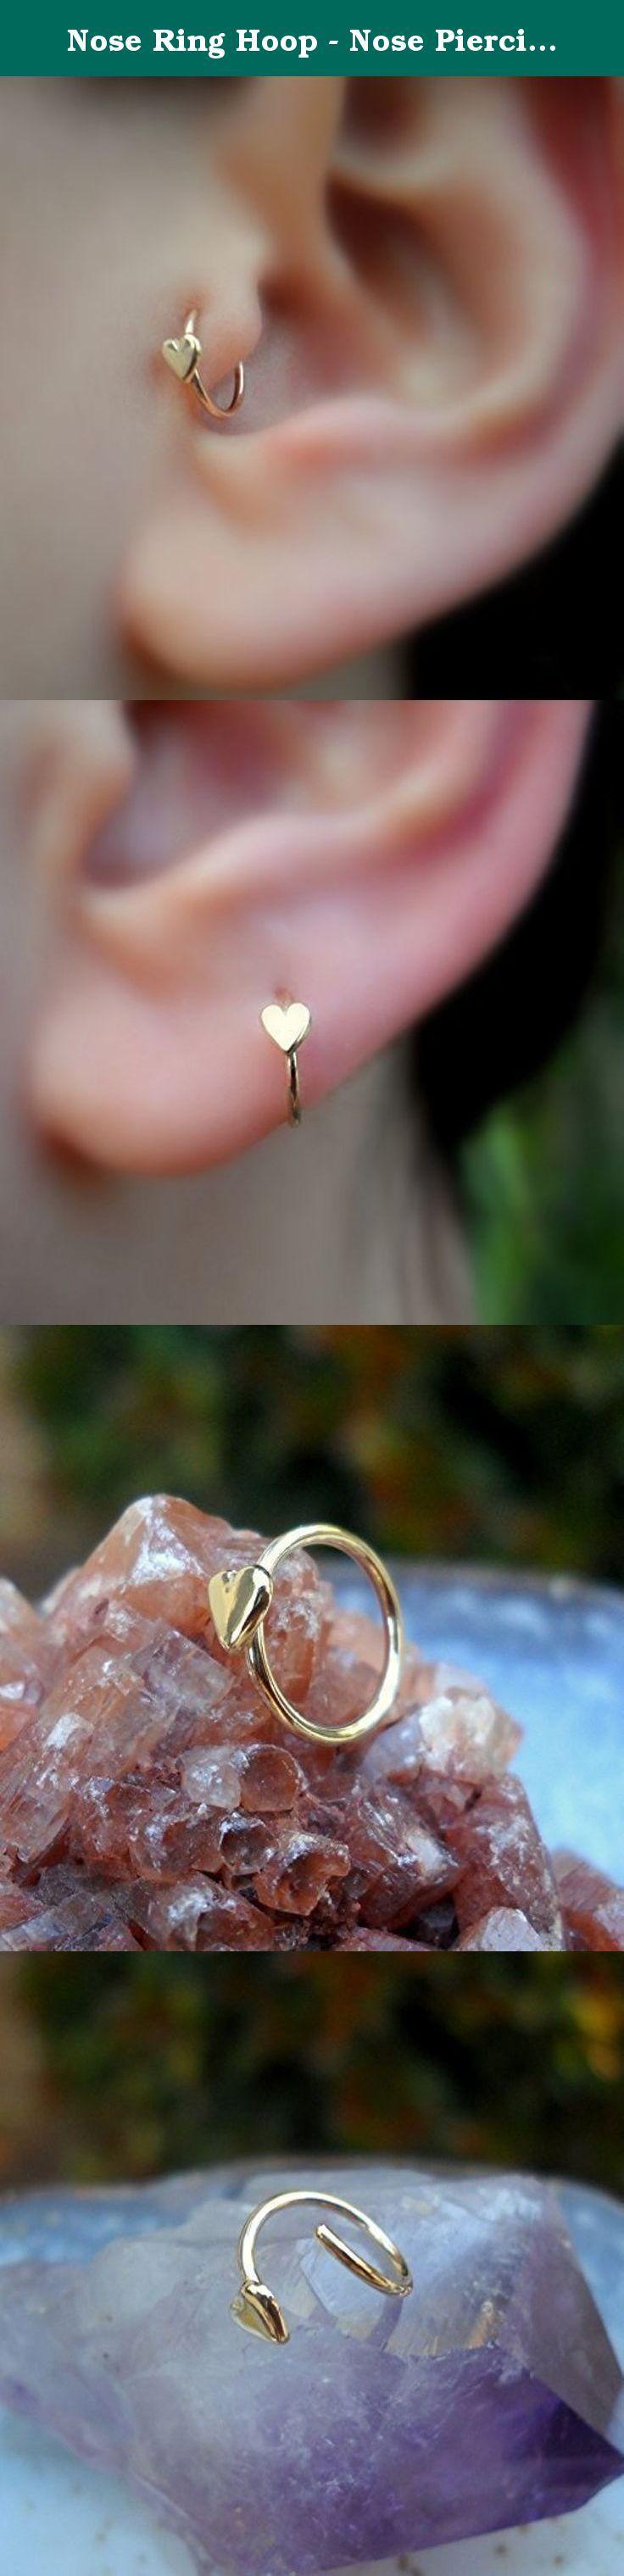 Nose Ring Hoop  Nose Piercing  Cartilage Tragus Earring 14k Solid Gold   20g